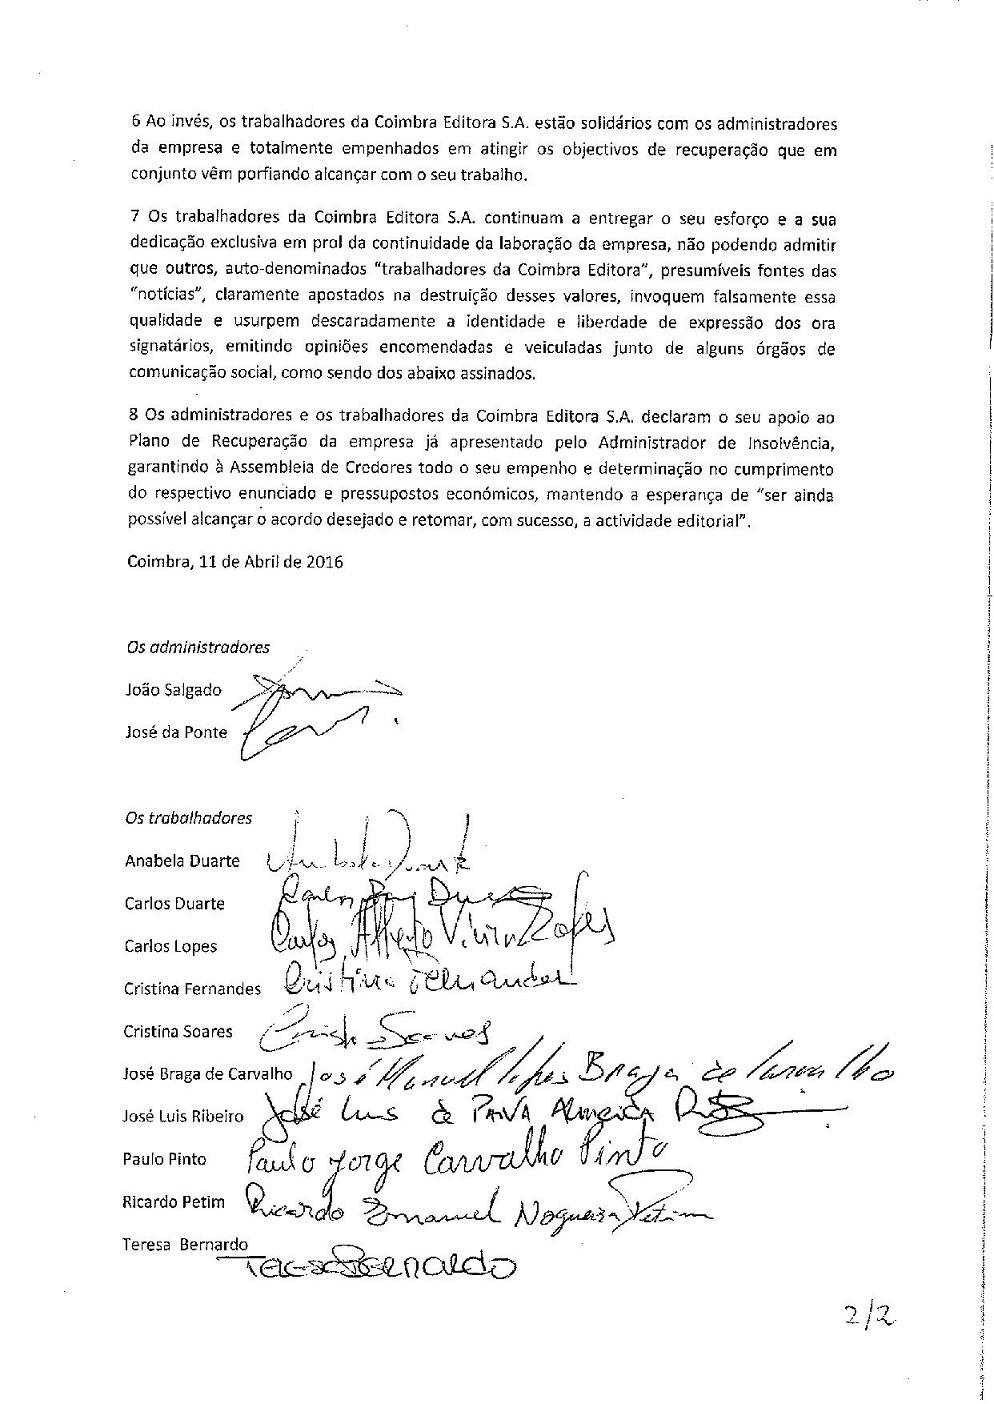 Comunicado-page-002